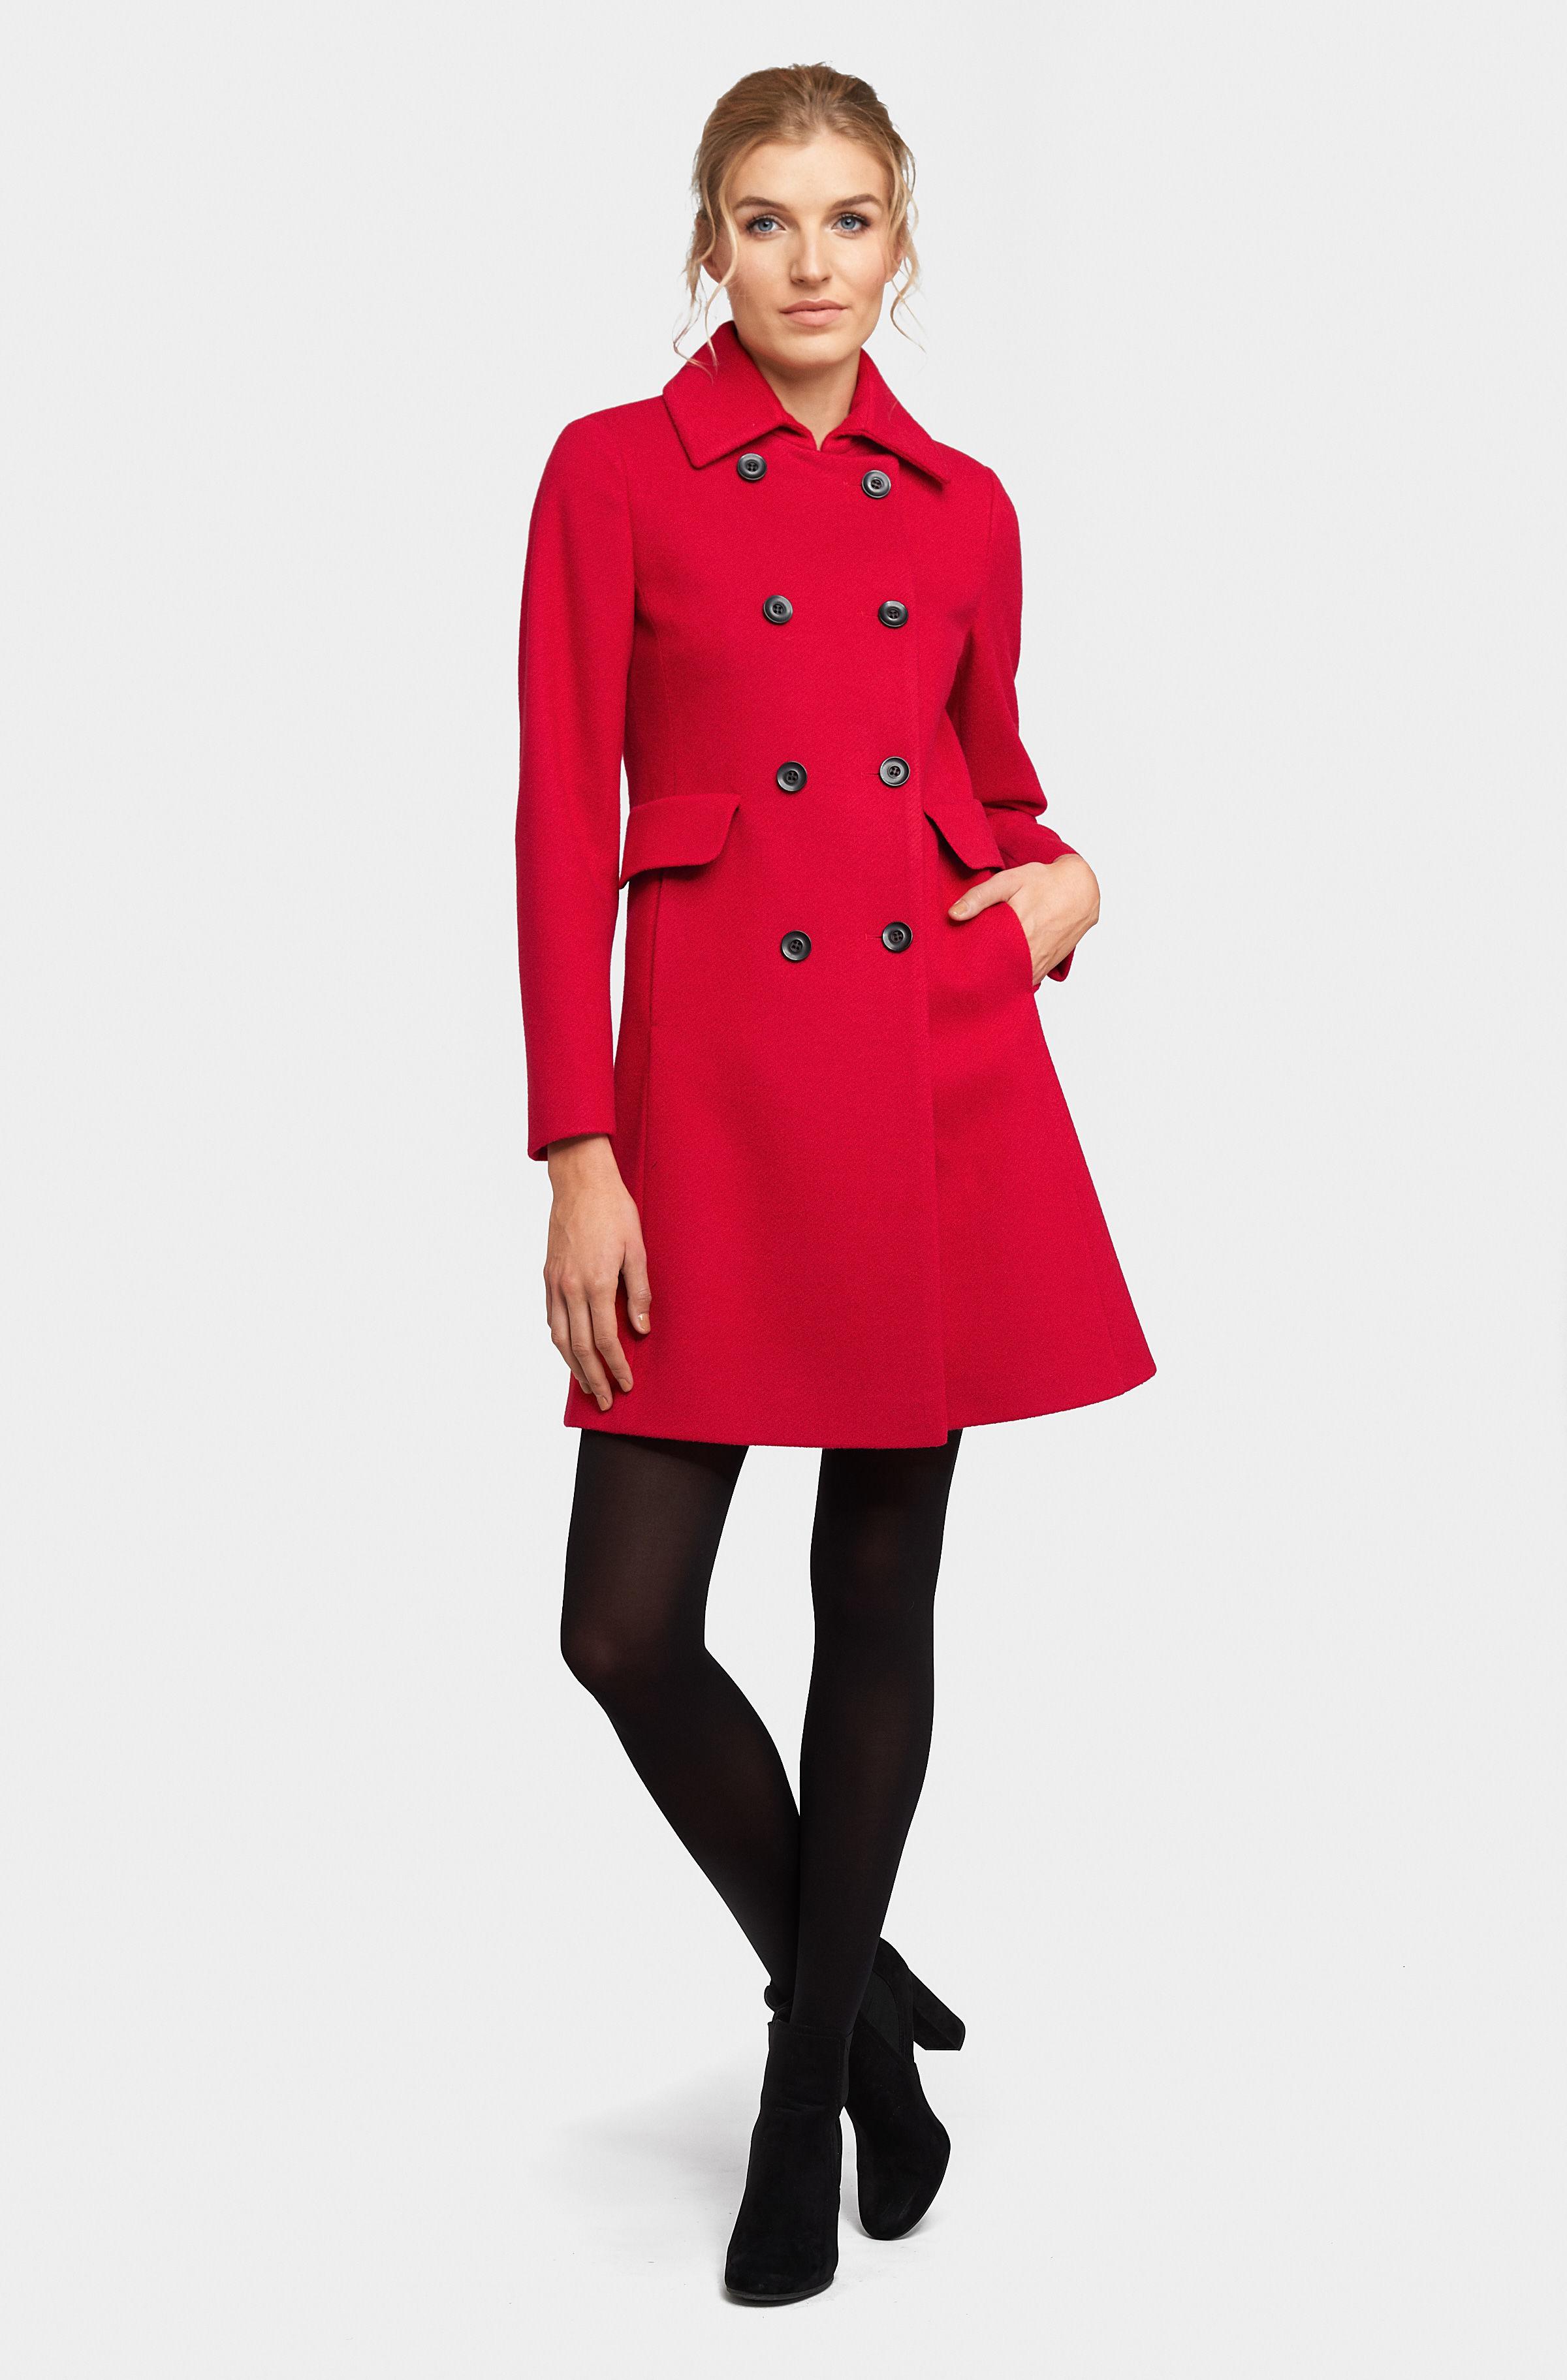 Kabát Cedric - Jeseň zima 2018 - E-shop - Chantall.sk e3fec2fa6a